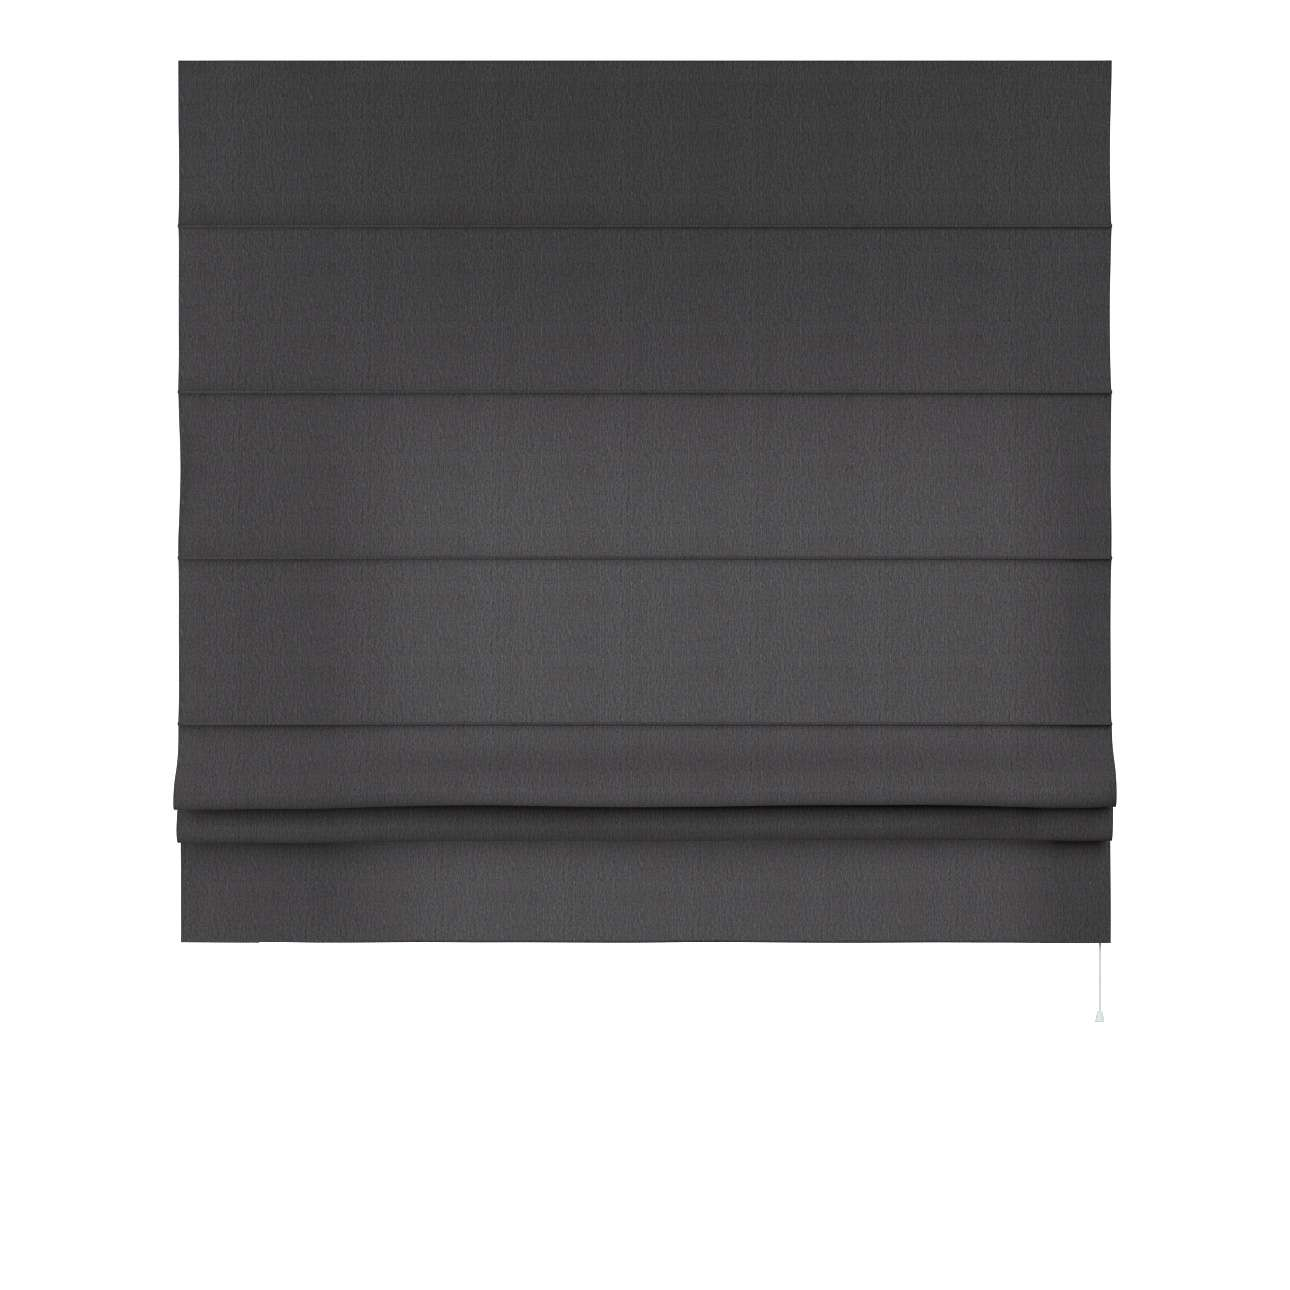 Vouwgordijn Padva 130 x 170 cm van de collectie Chenille, Stof: 702-20